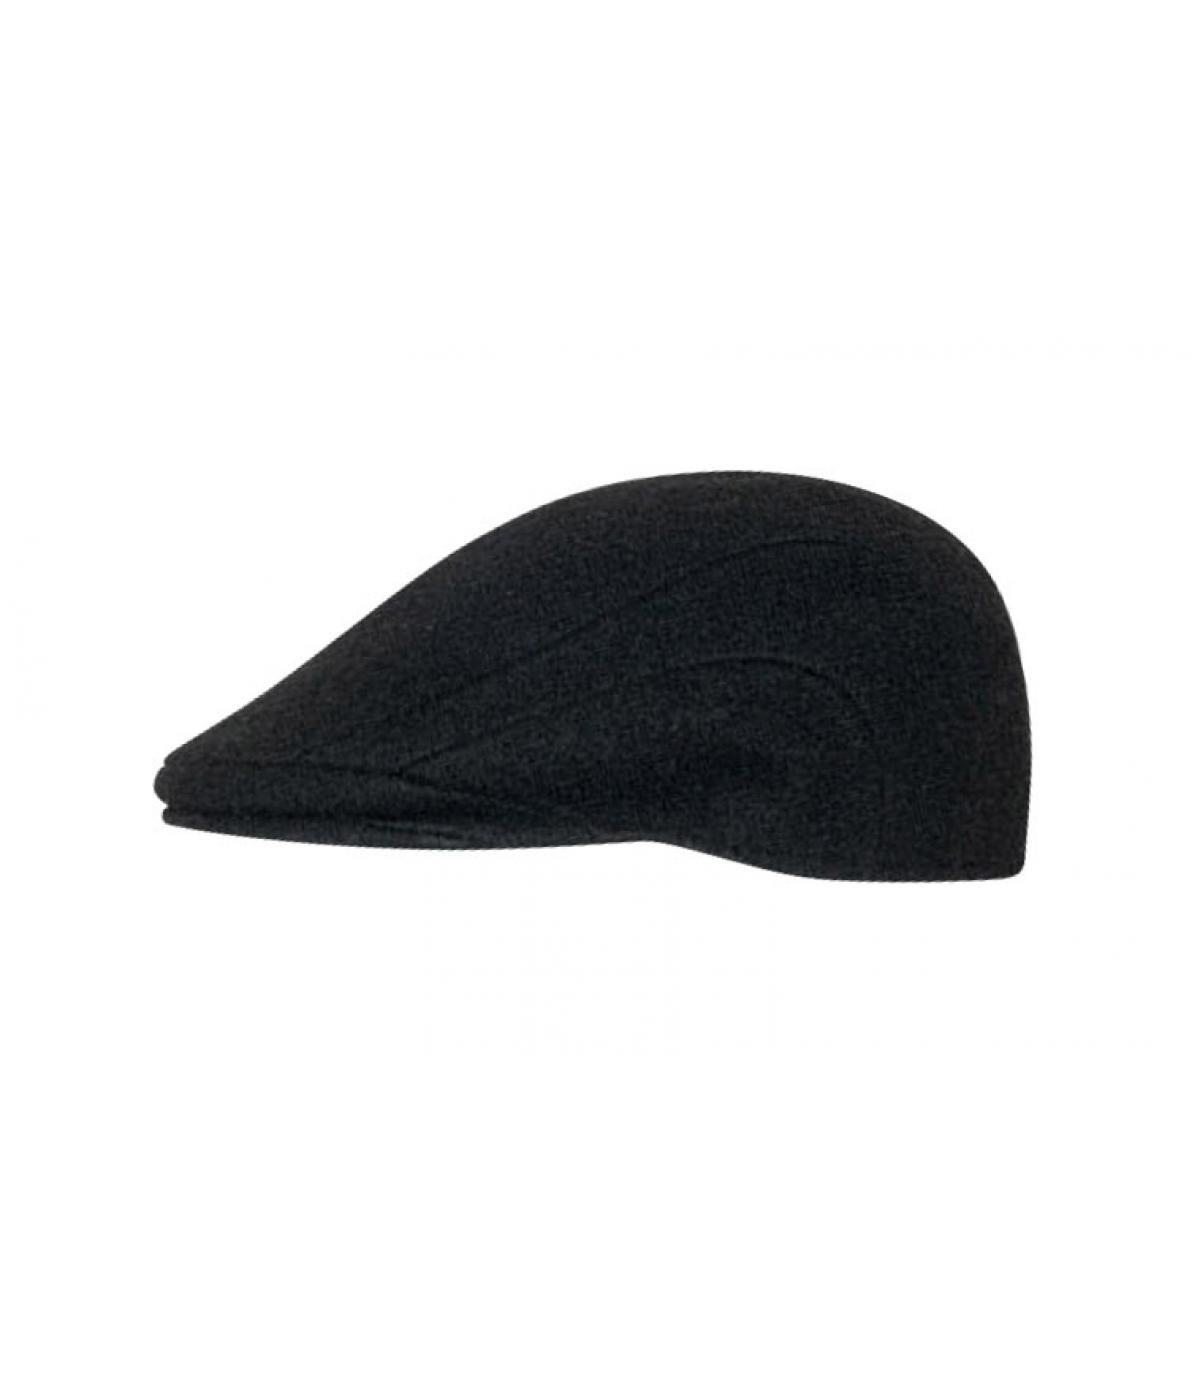 Kangol 507 black